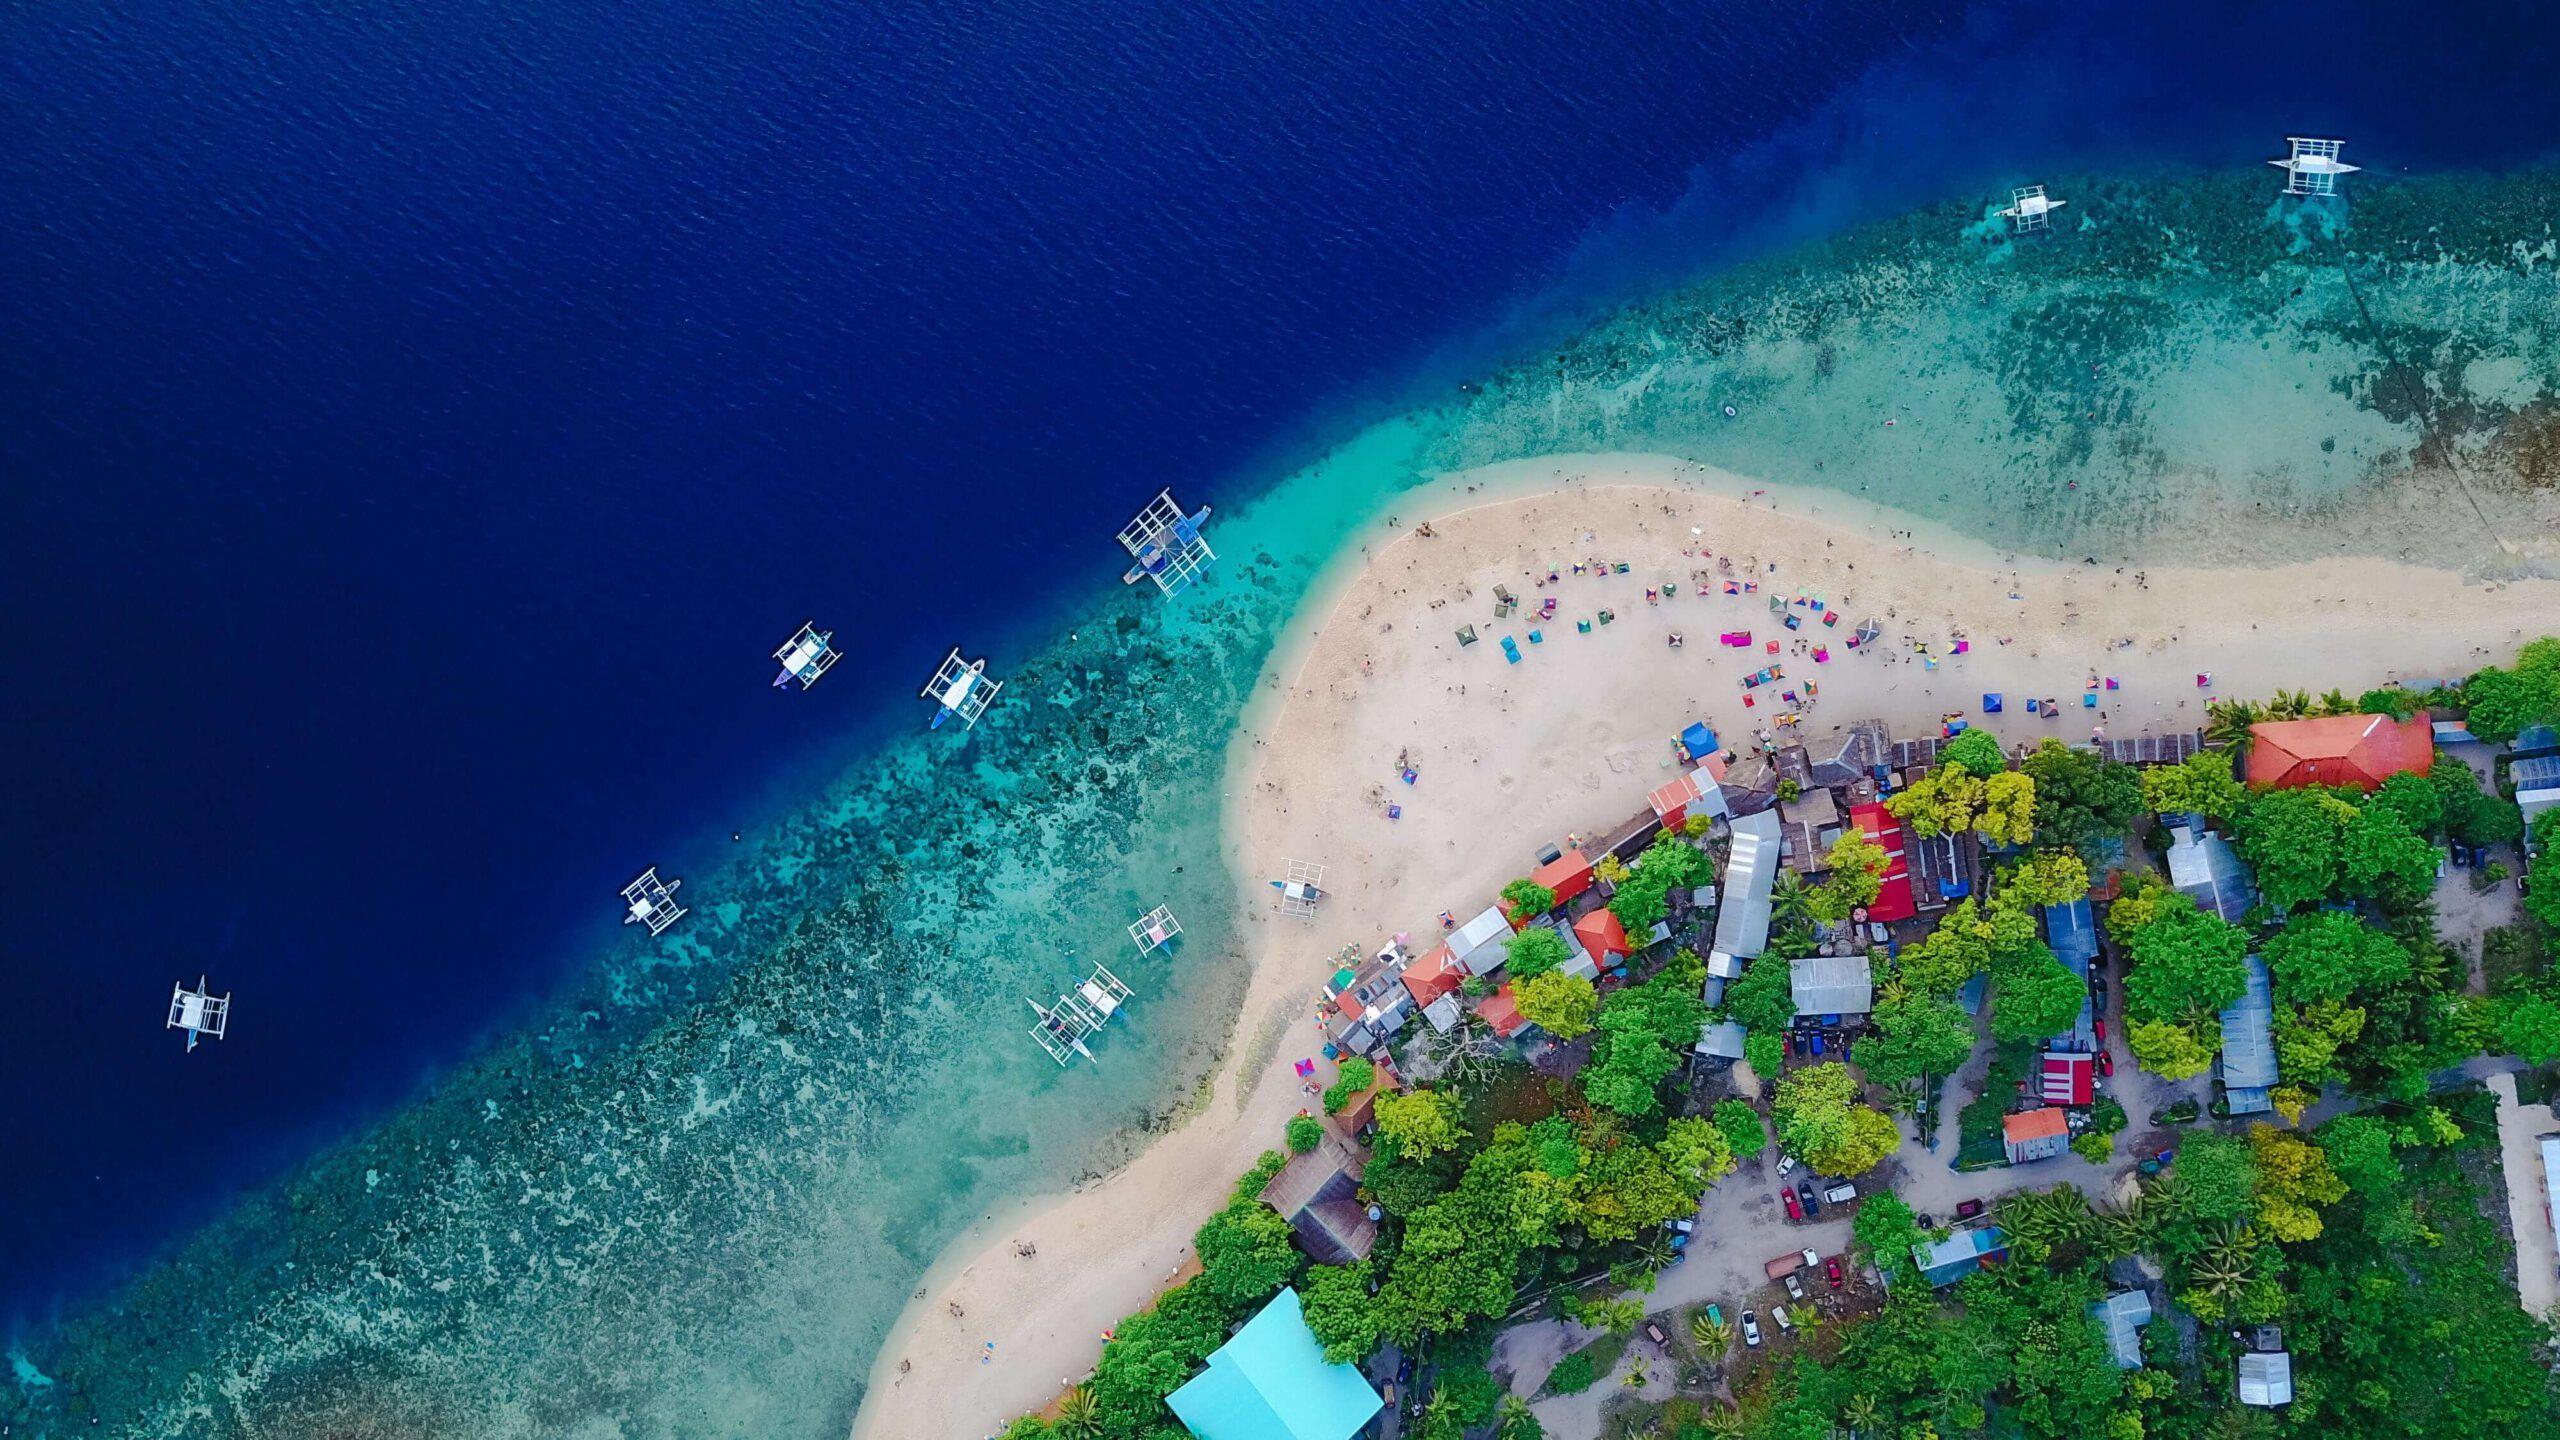 Fotos de Cebu